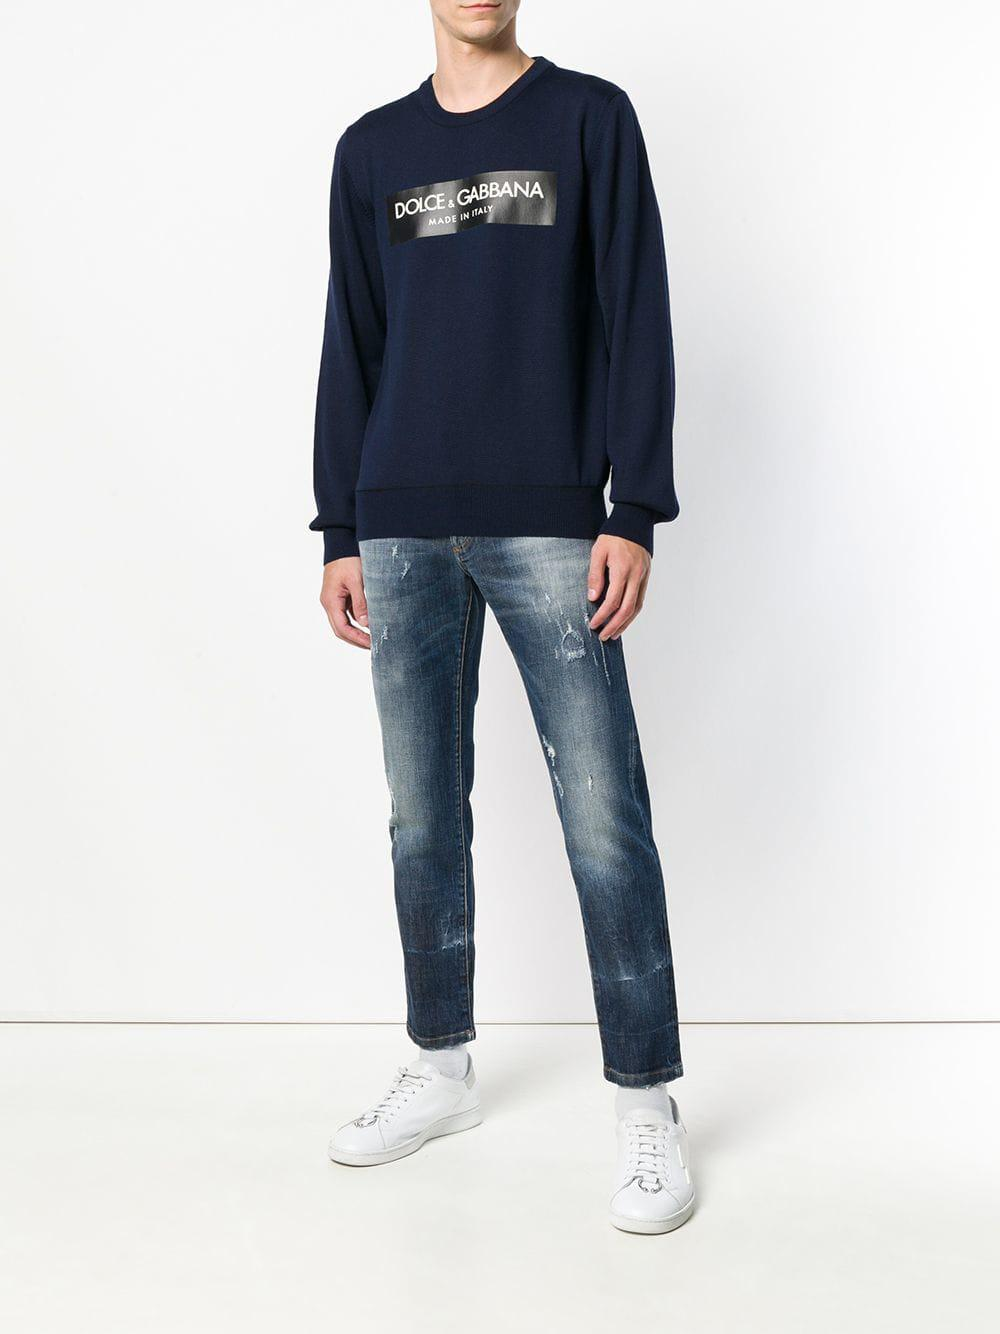 Dolce & Gabbana Denim Faded Slim Fit Jeans in Blue for Men